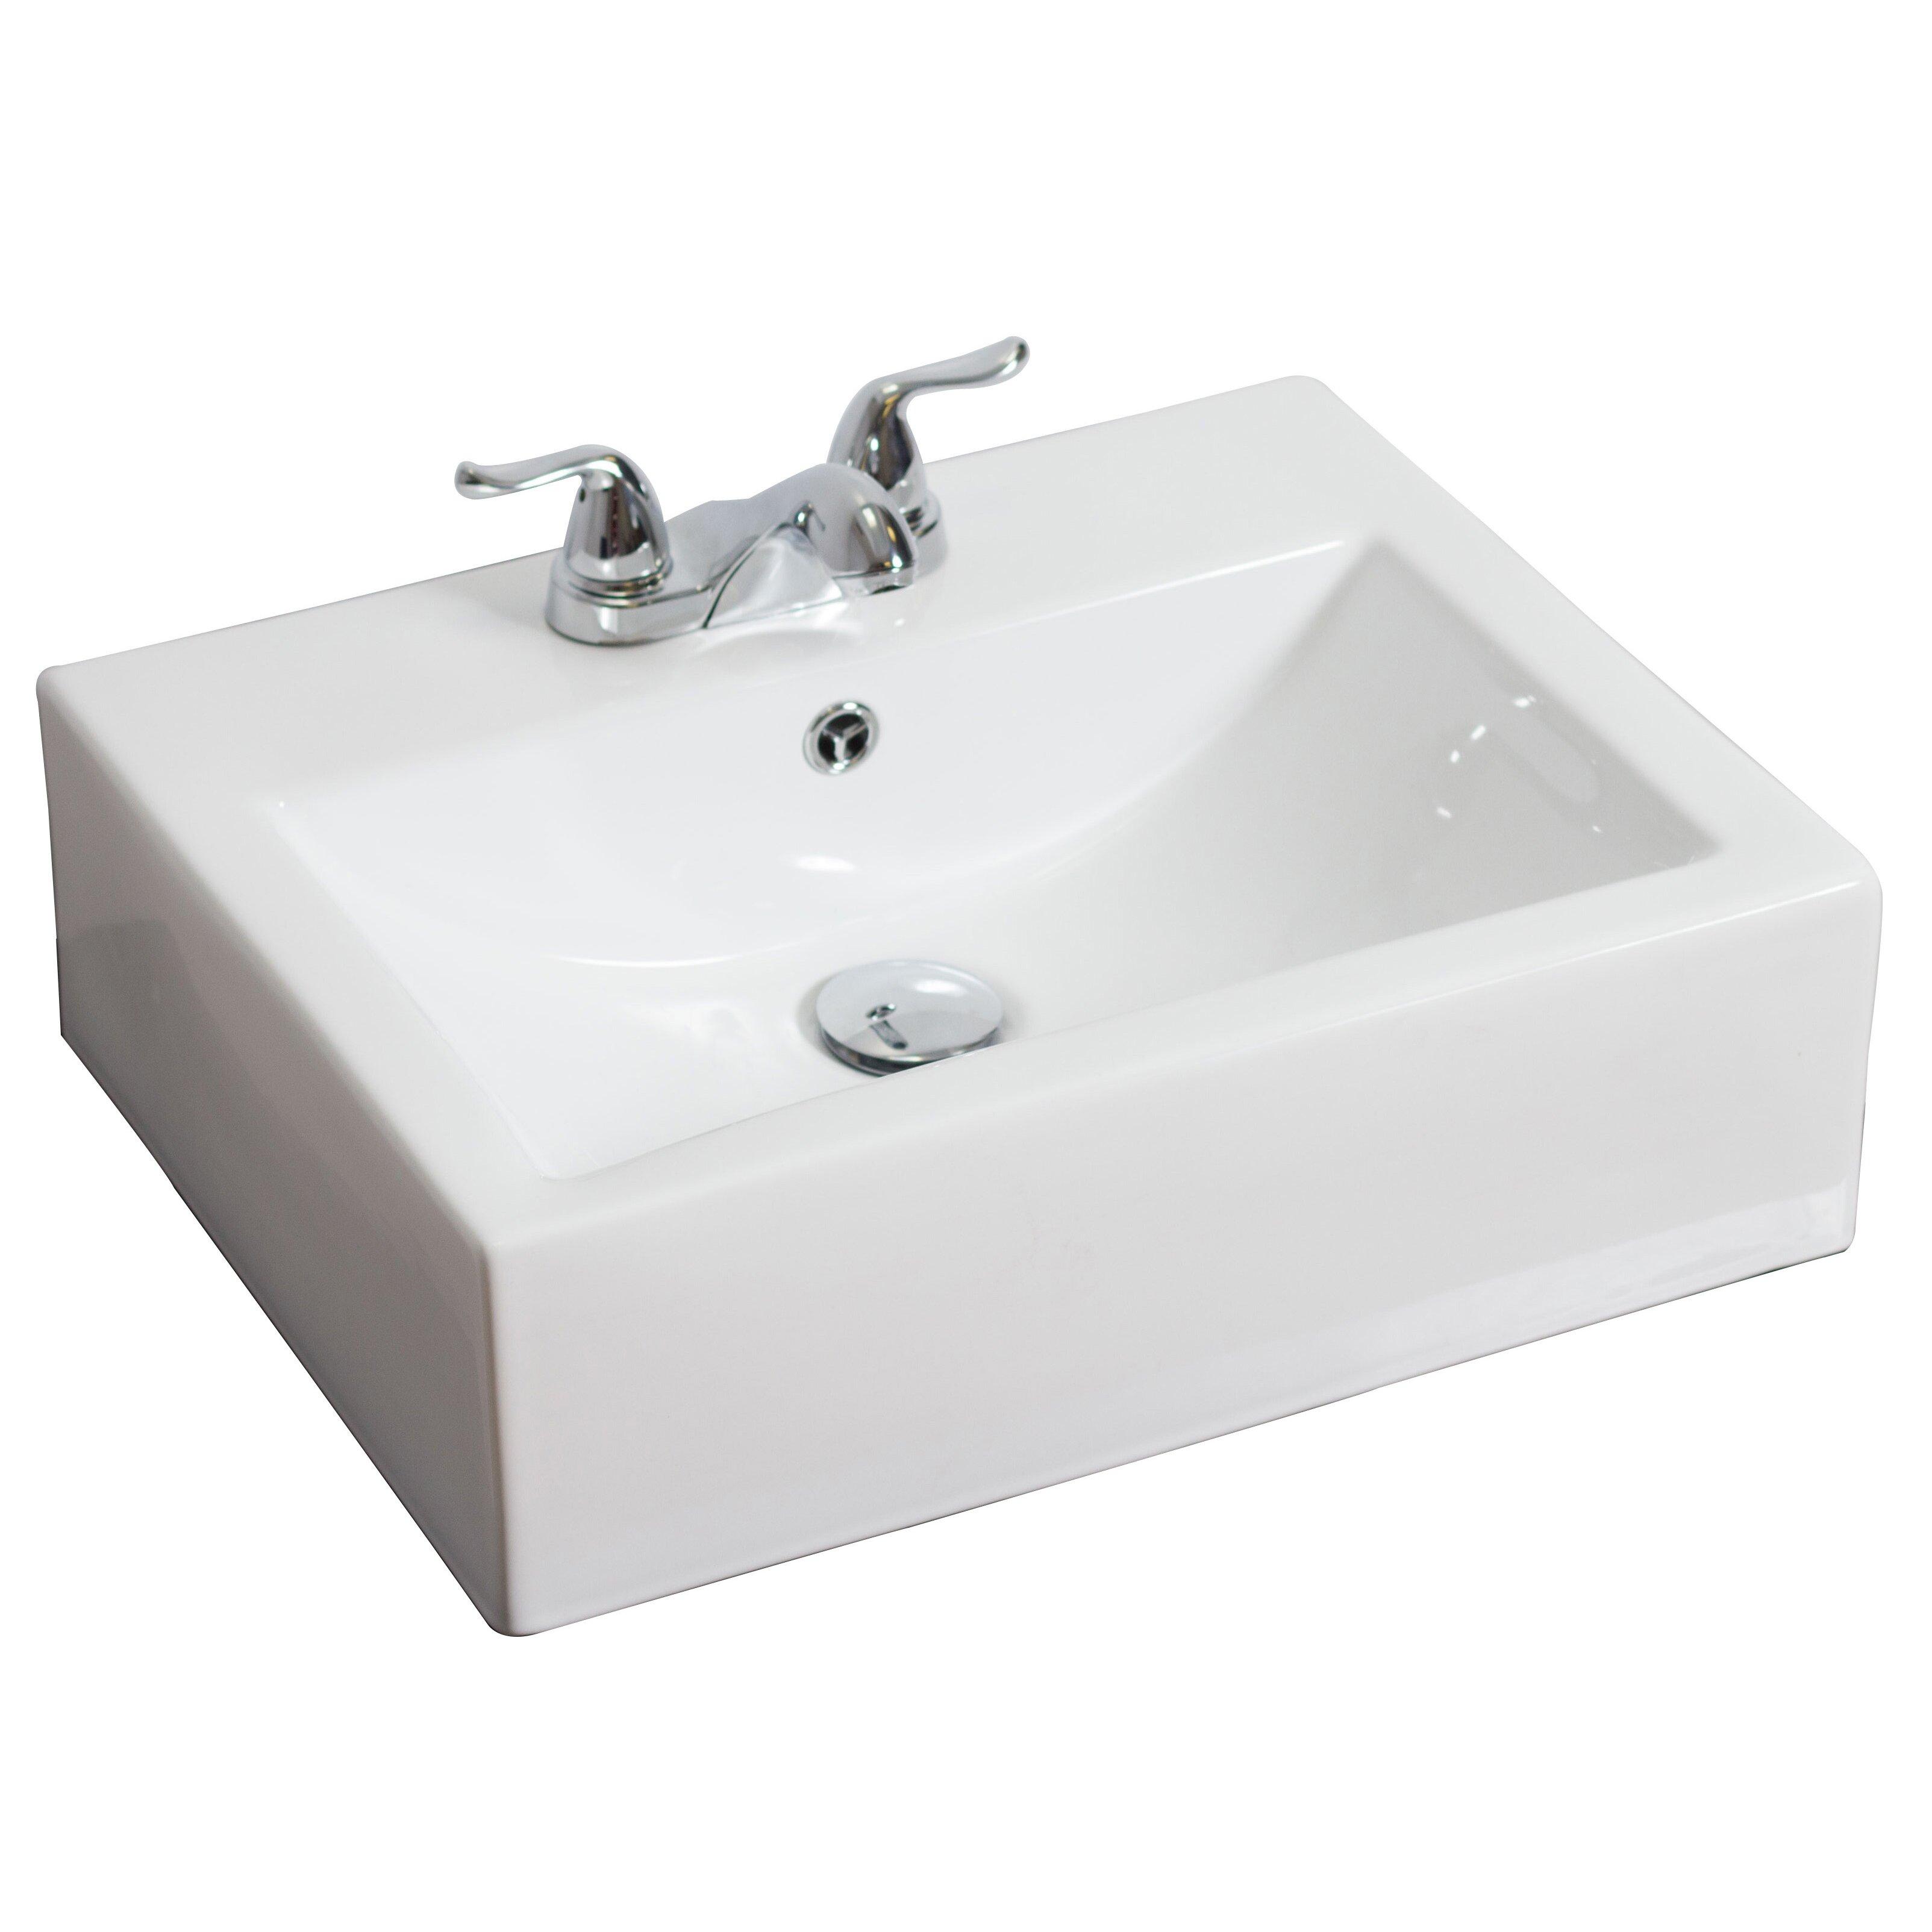 american imaginations above counter rectangle vessel bathroom sink reviews wayfair. Black Bedroom Furniture Sets. Home Design Ideas